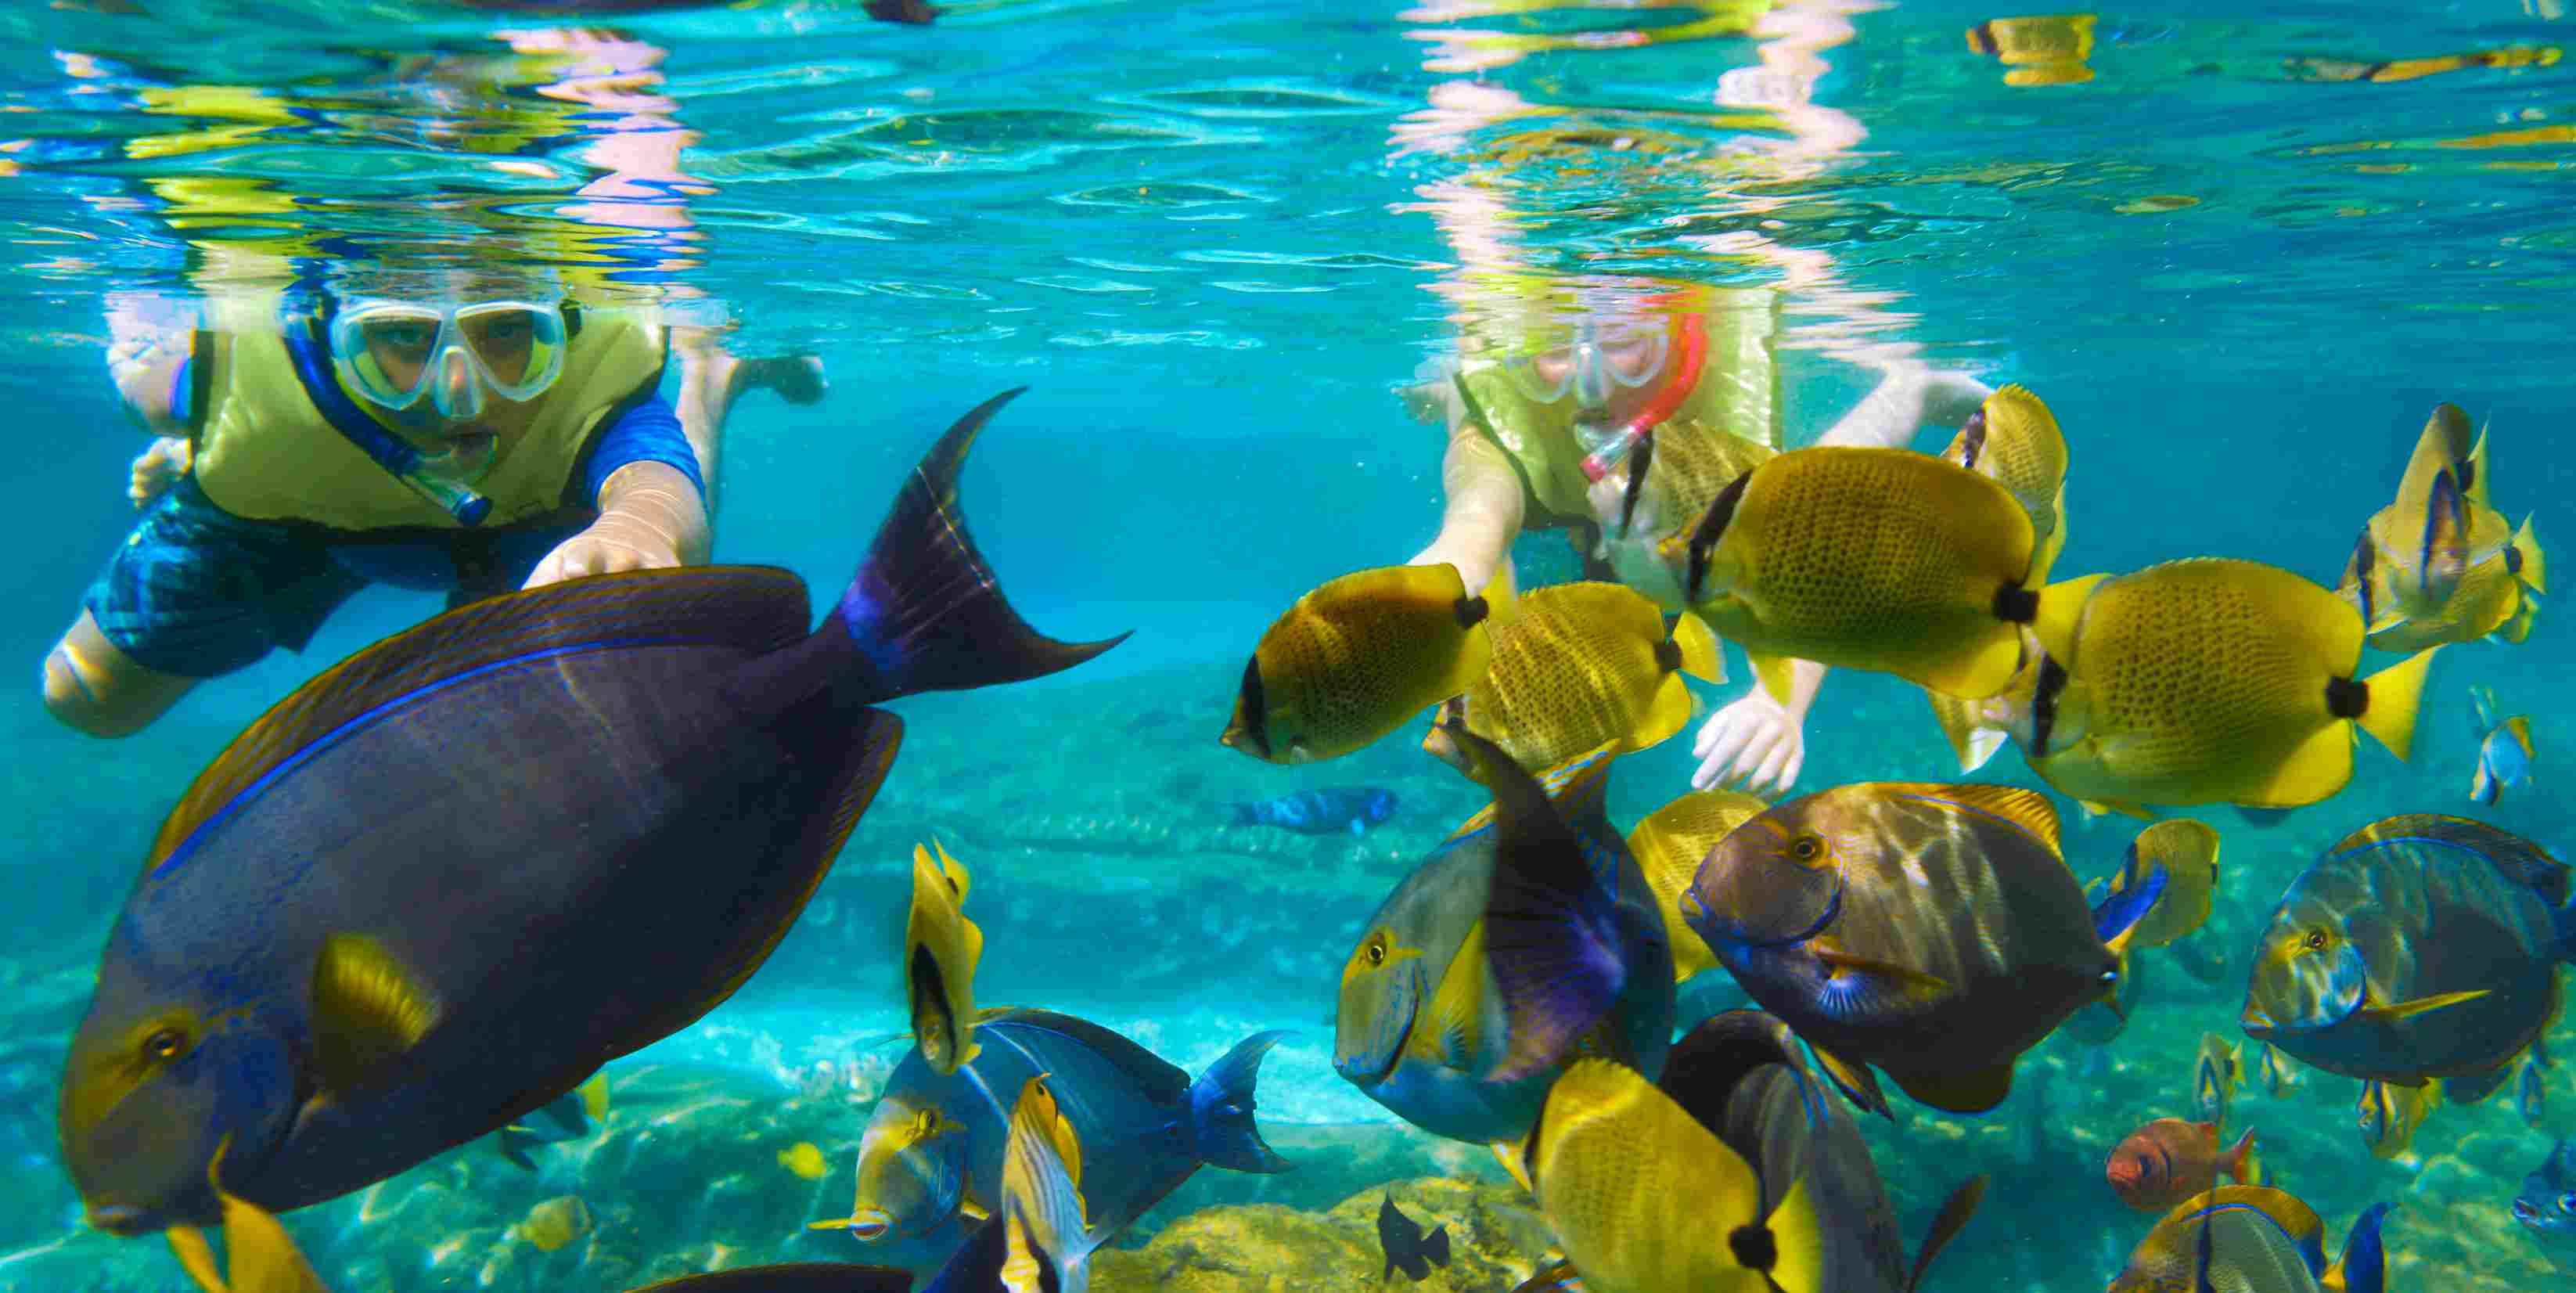 Snorkeling at Aulani's Rainbow Reef